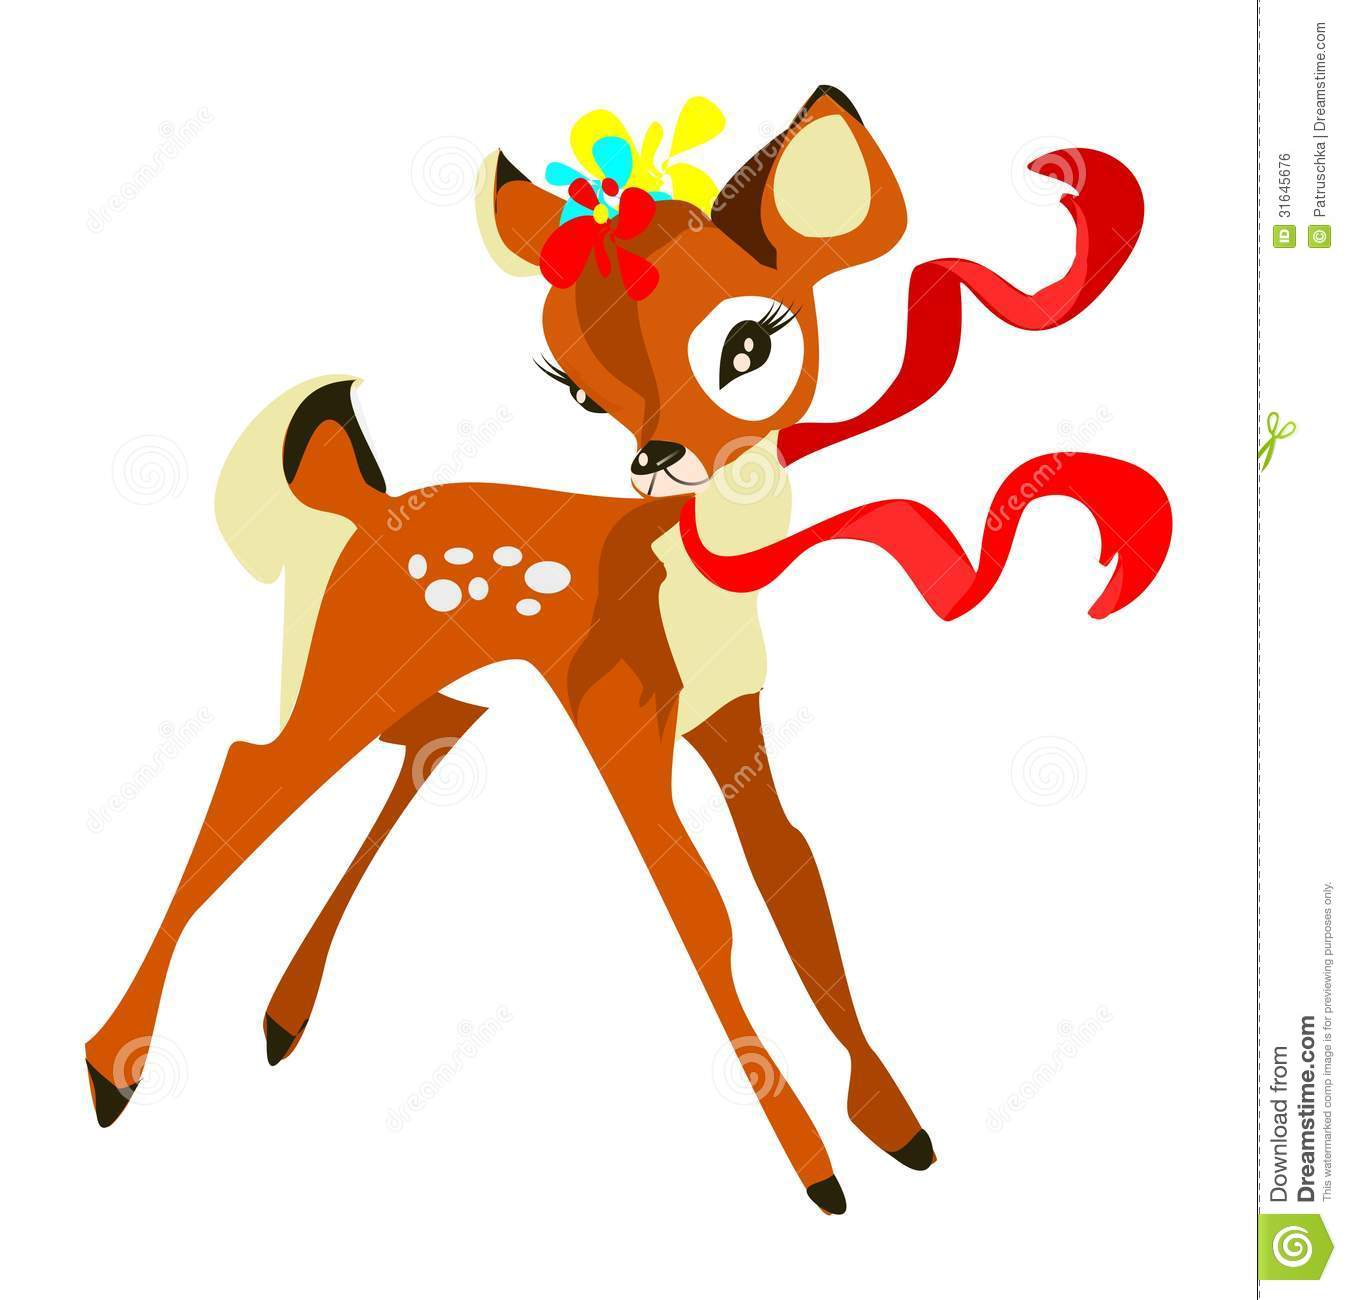 cute baby deer clipart clipart panda free clipart images rh clipartpanda com free baby deer clipart mom and baby deer clipart